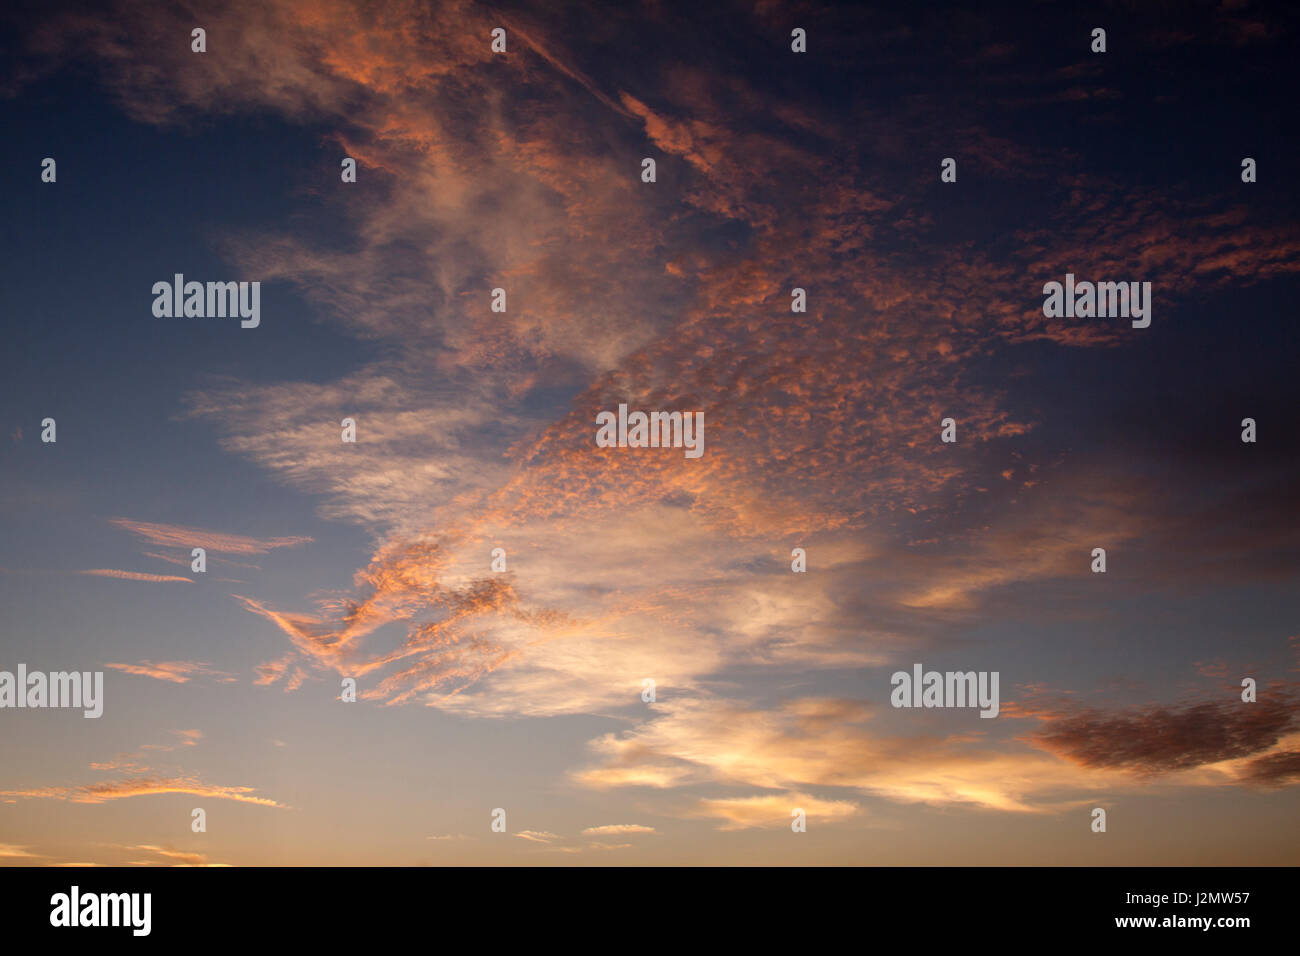 Clouds Above Siesta Key in Sarasota, Florida Beach During Sunset - Stock Image